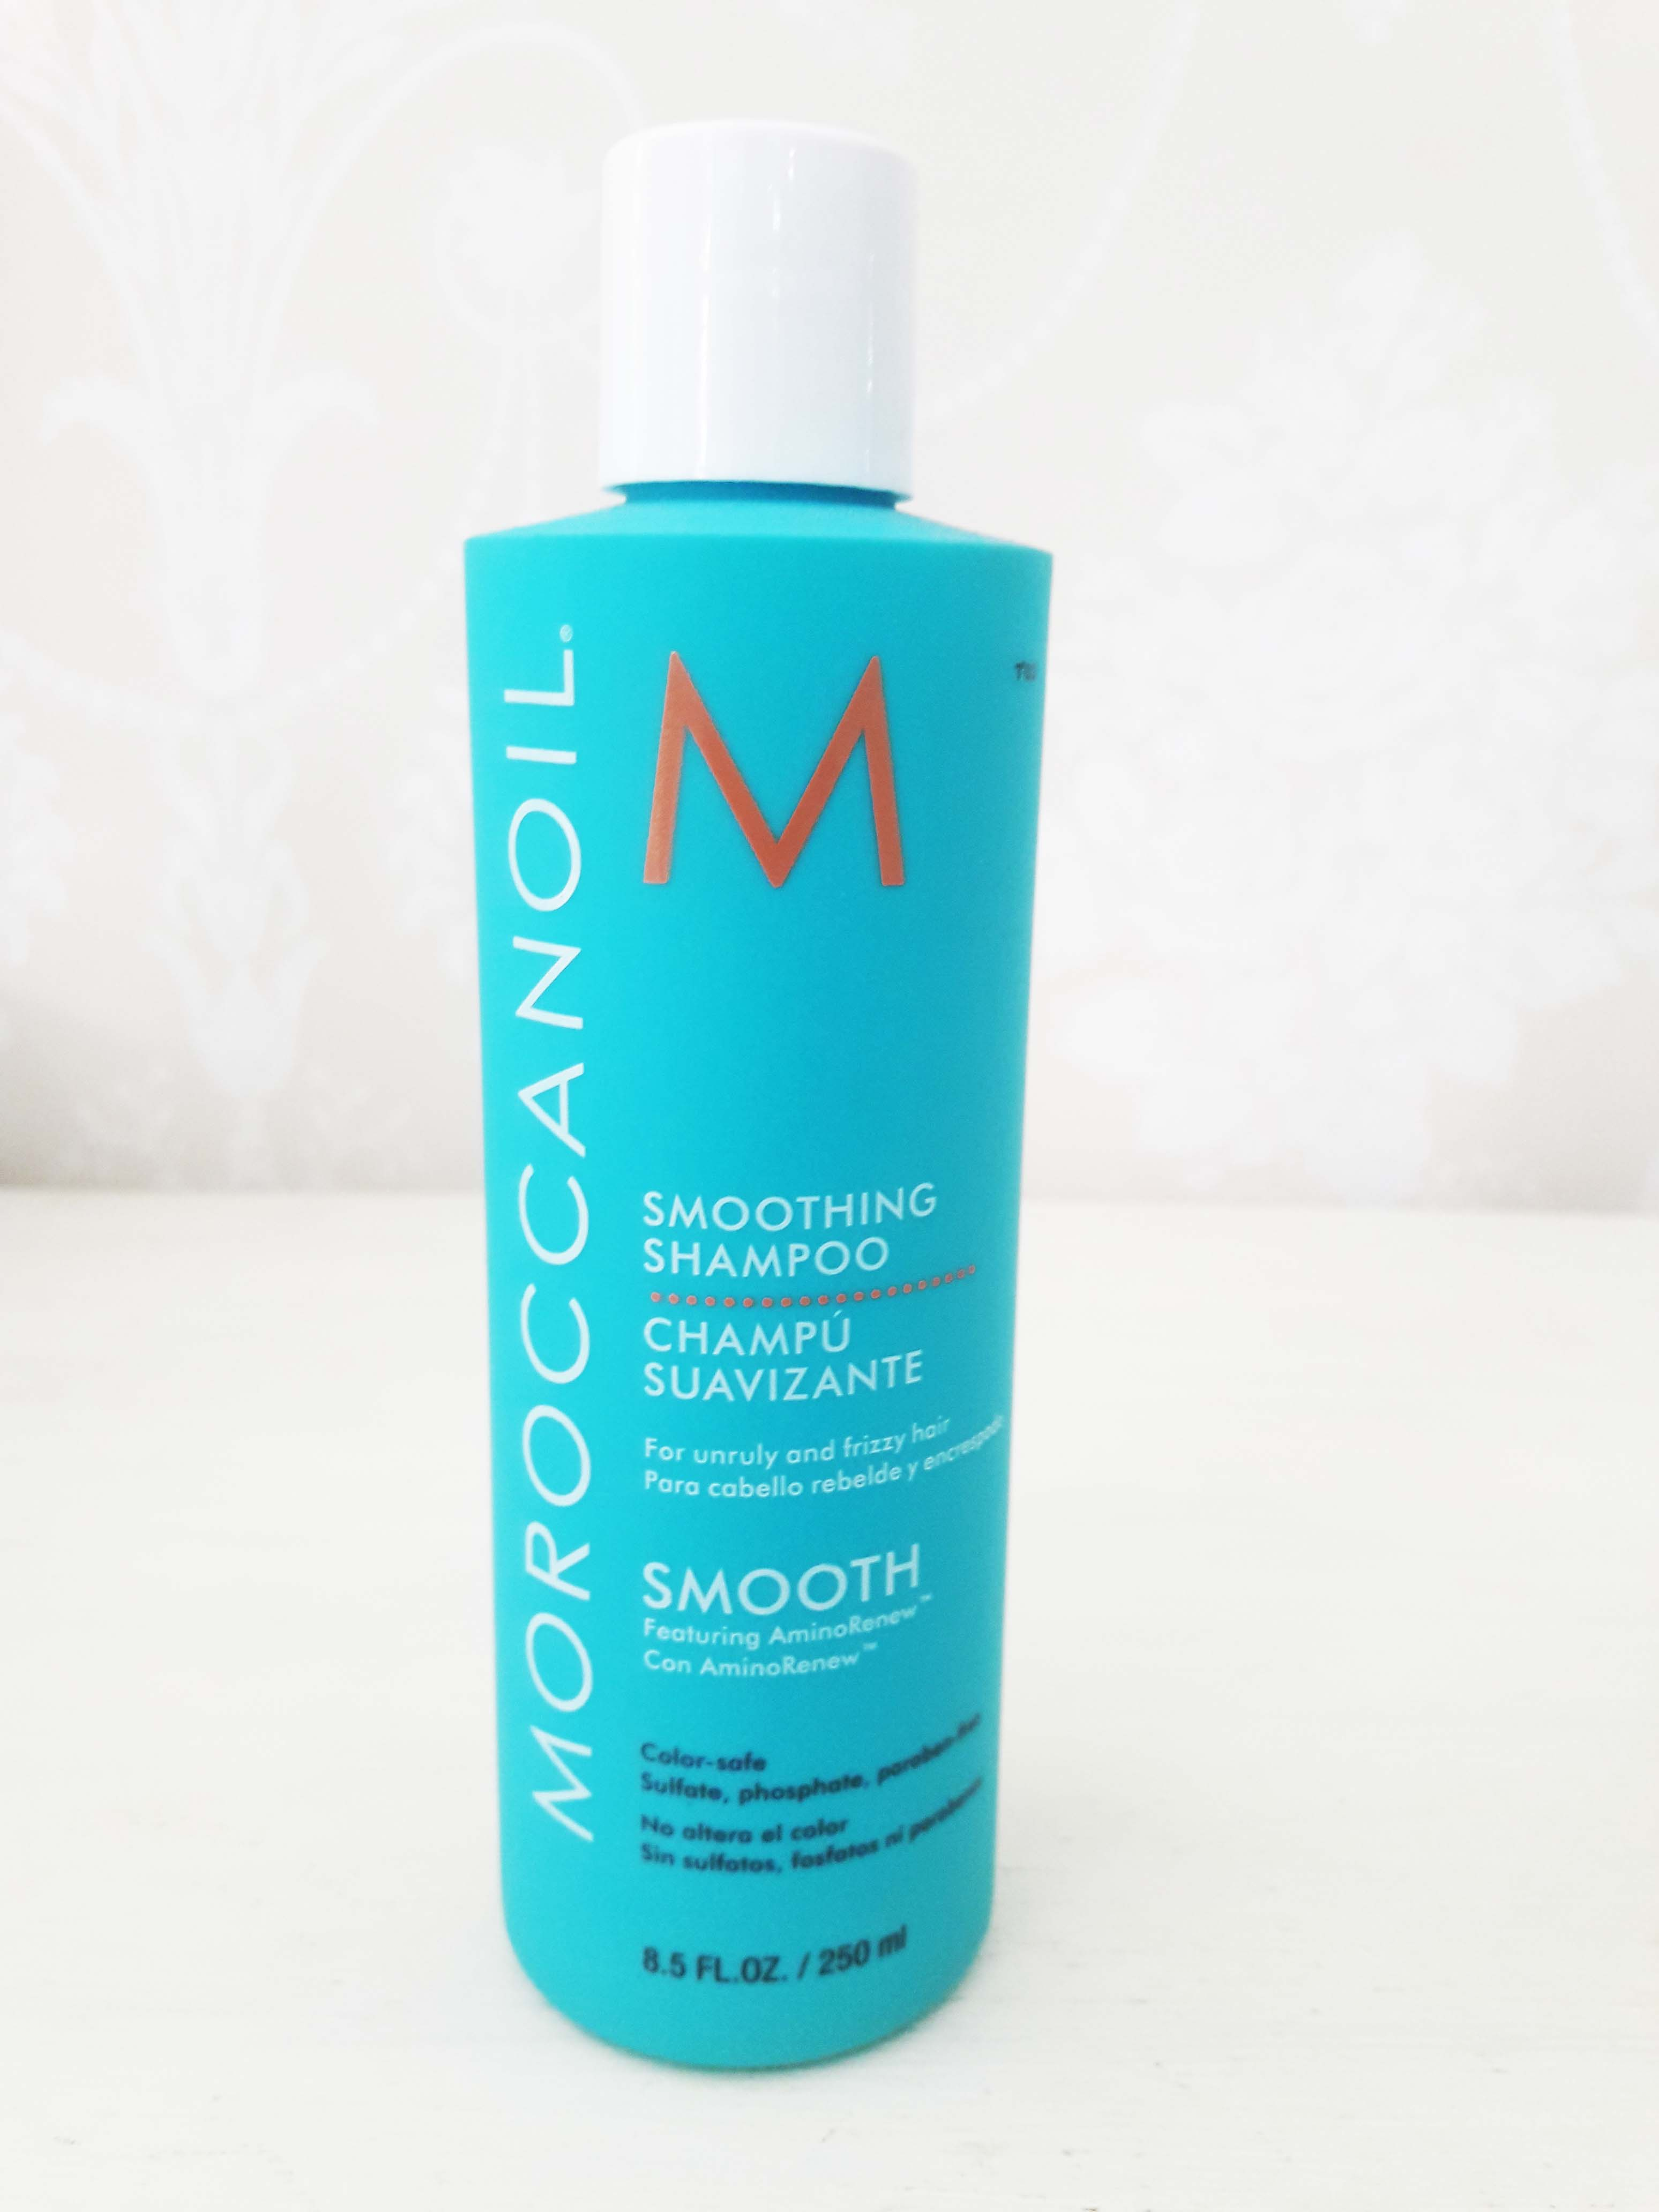 Shampoo Suavizante cabellos crespos y rebeldes Moroccanoil 250 ml. $17.900